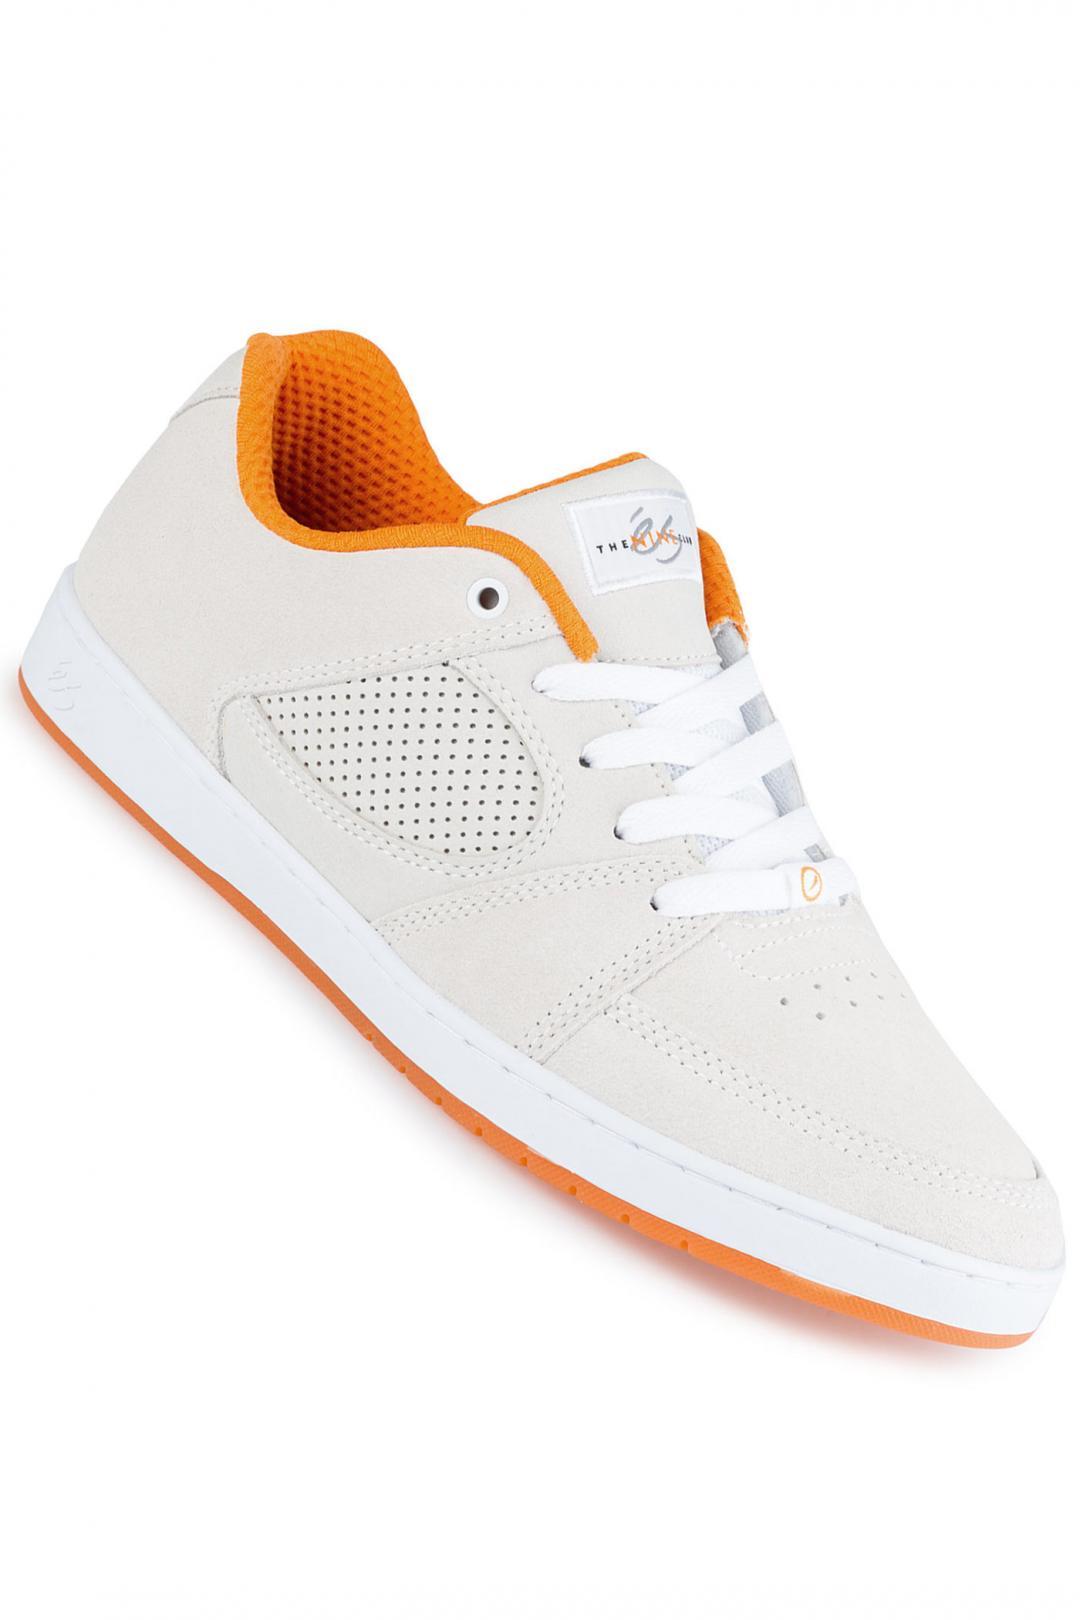 Uomo éS x The Nine Club Accel Slim white | Sneakers low top